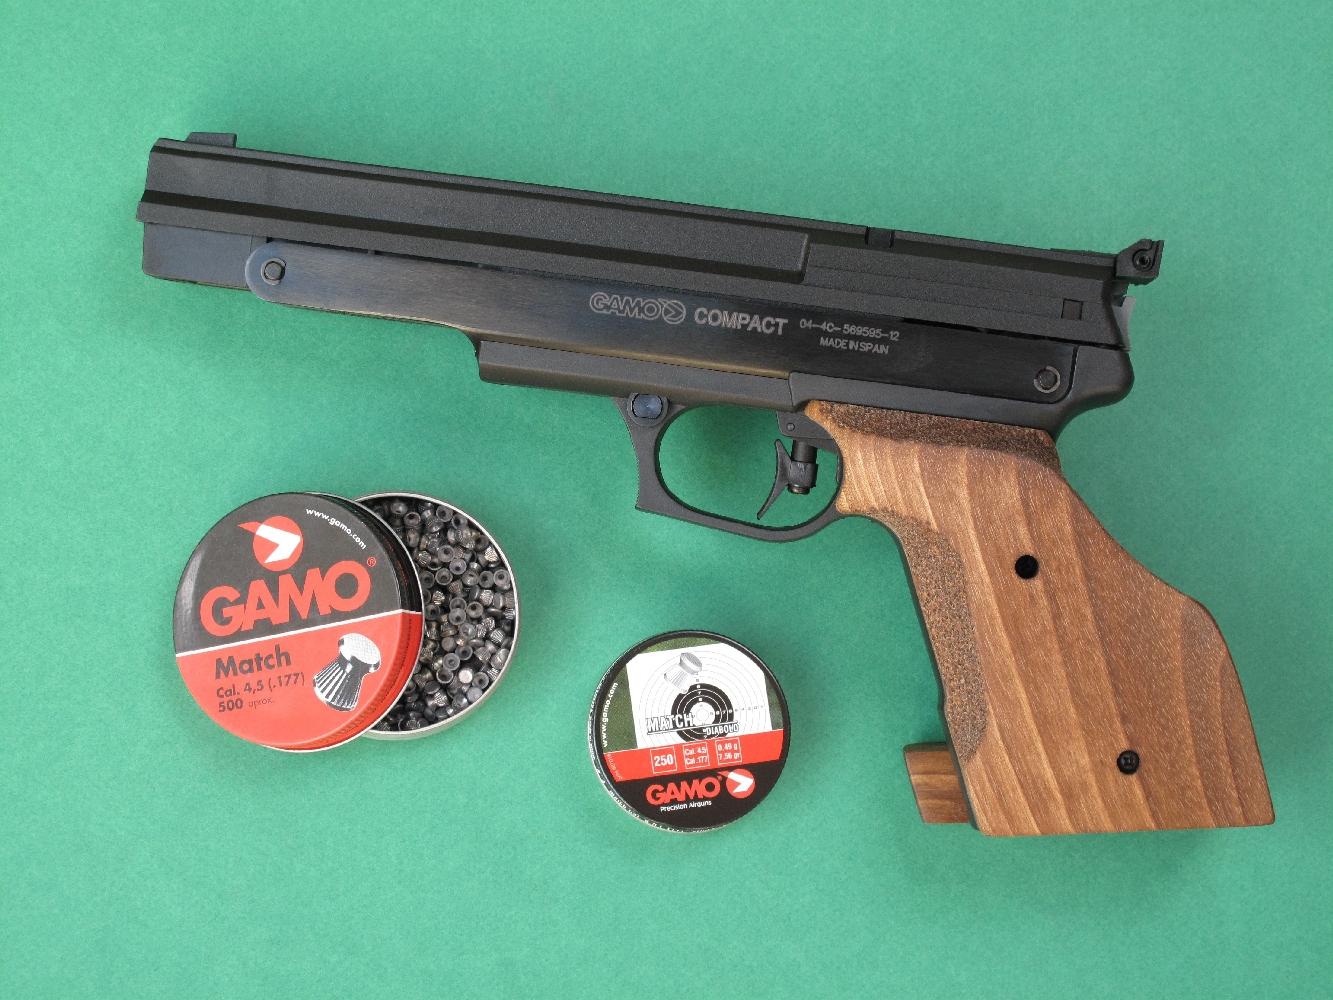 essai armes pistolet air comprim gamo compact calibre 4 5 mm diabolo. Black Bedroom Furniture Sets. Home Design Ideas